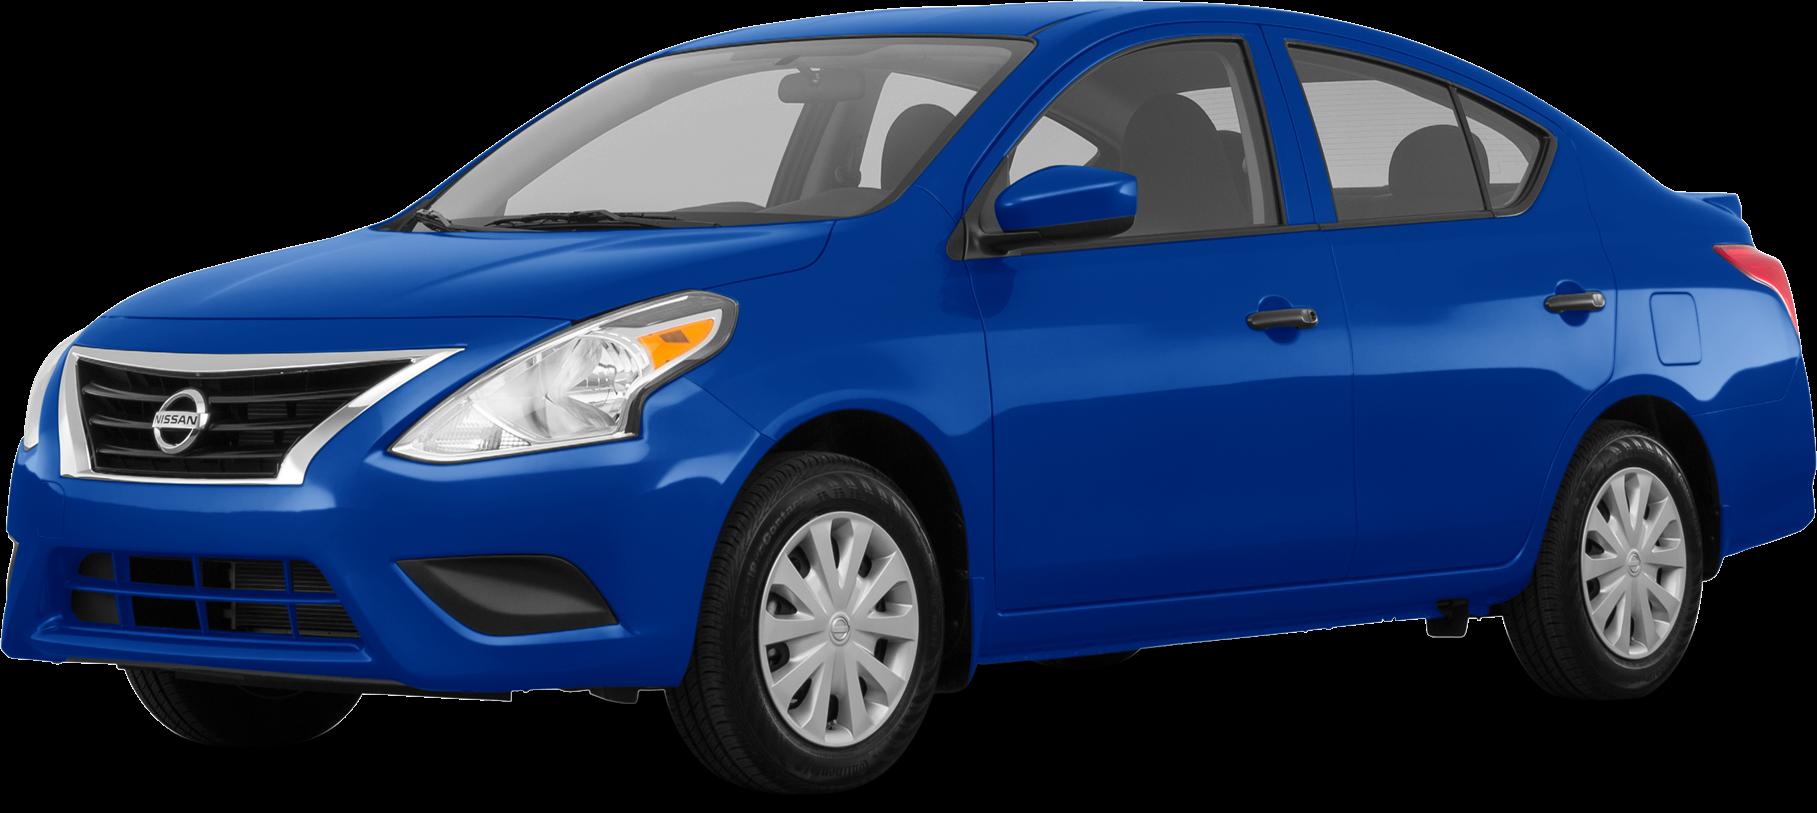 2016 Nissan Versa Values Cars For Sale Kelley Blue Book